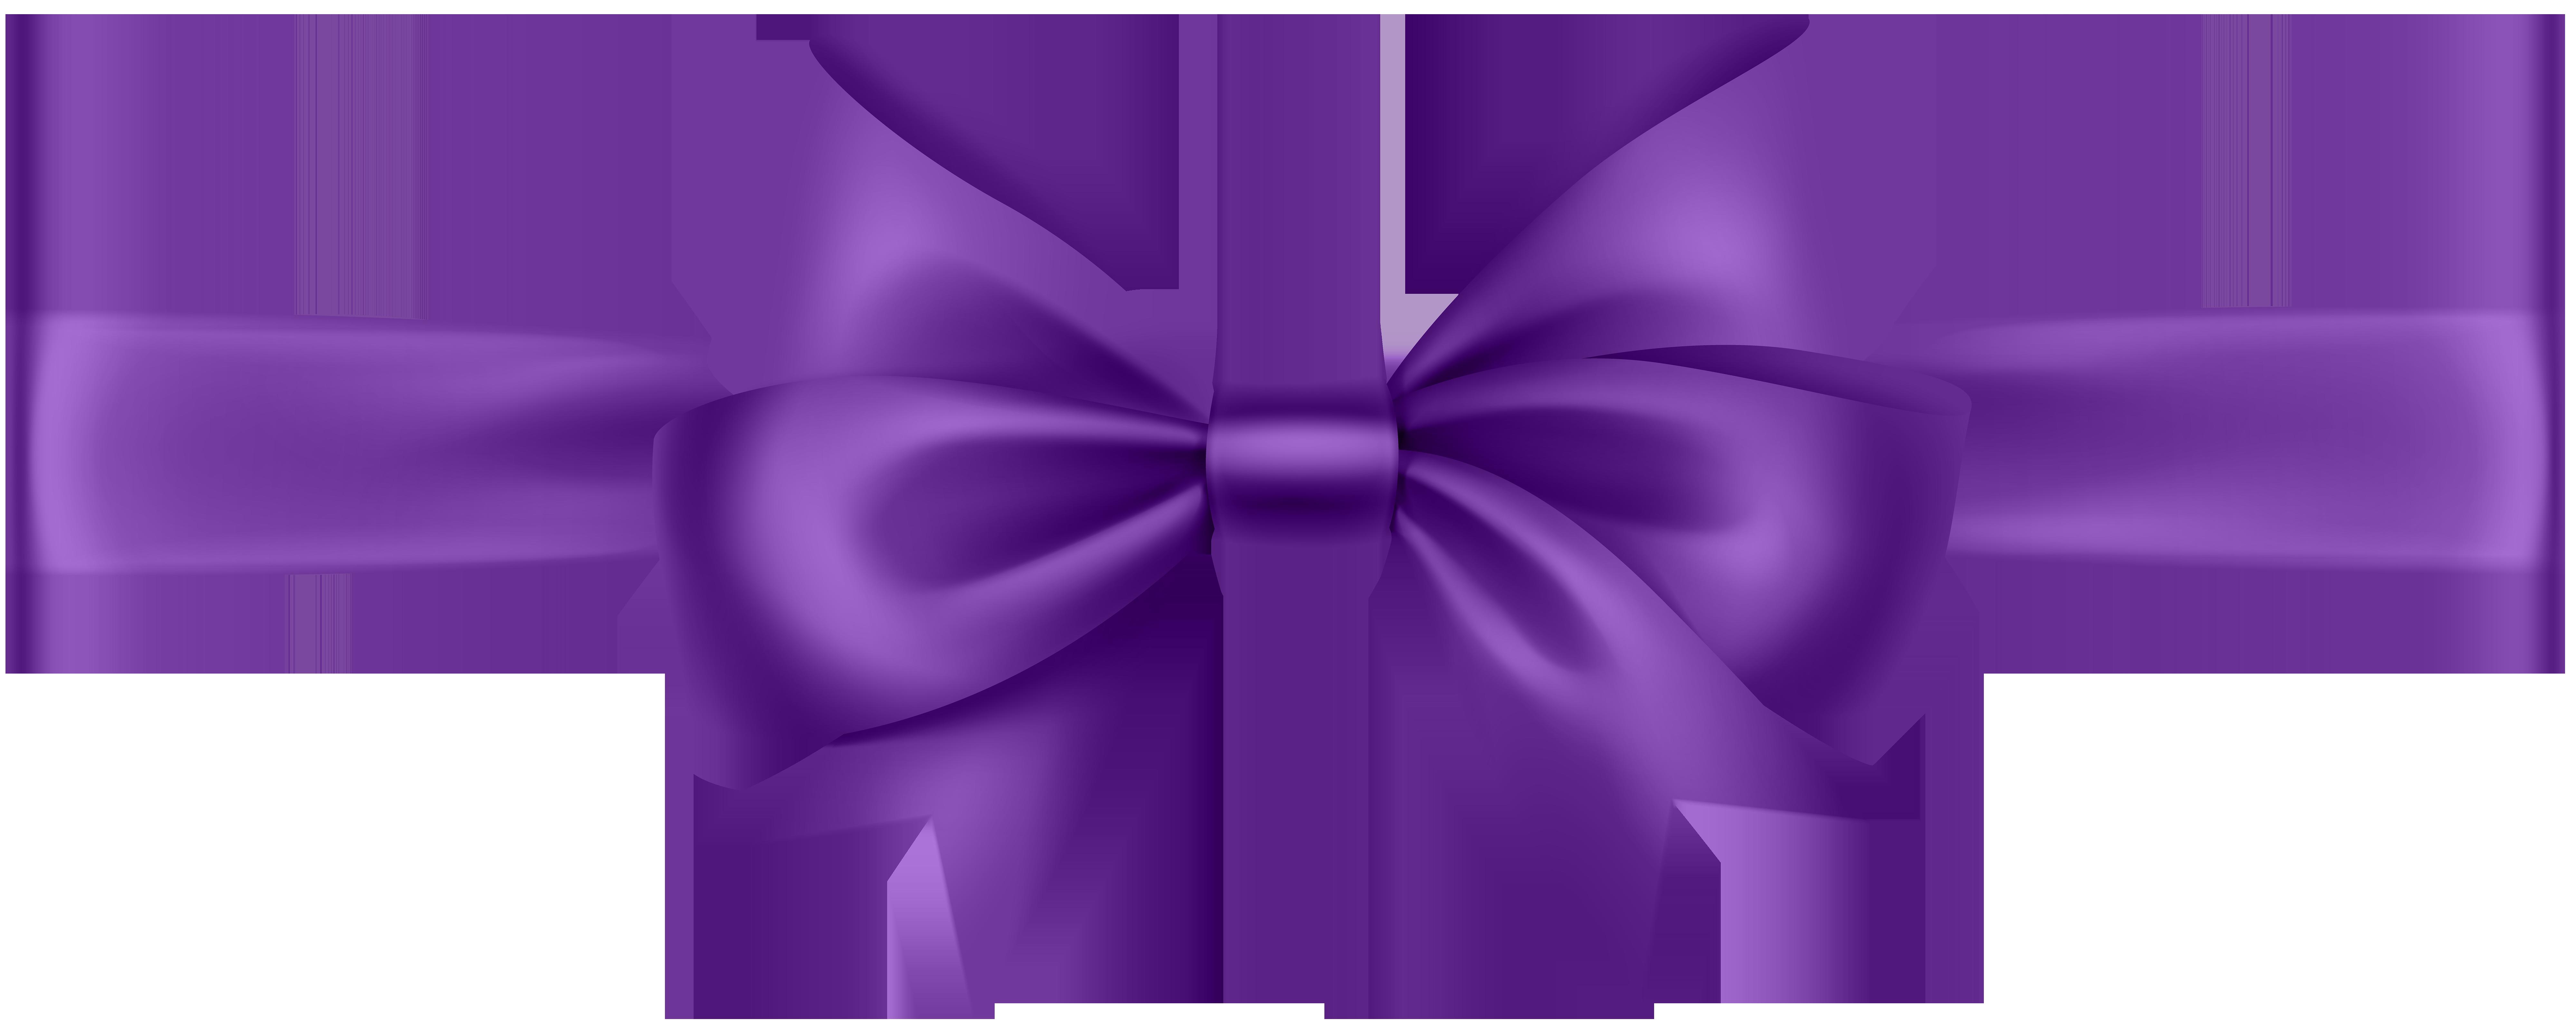 Purple Bow Tie Clipart.